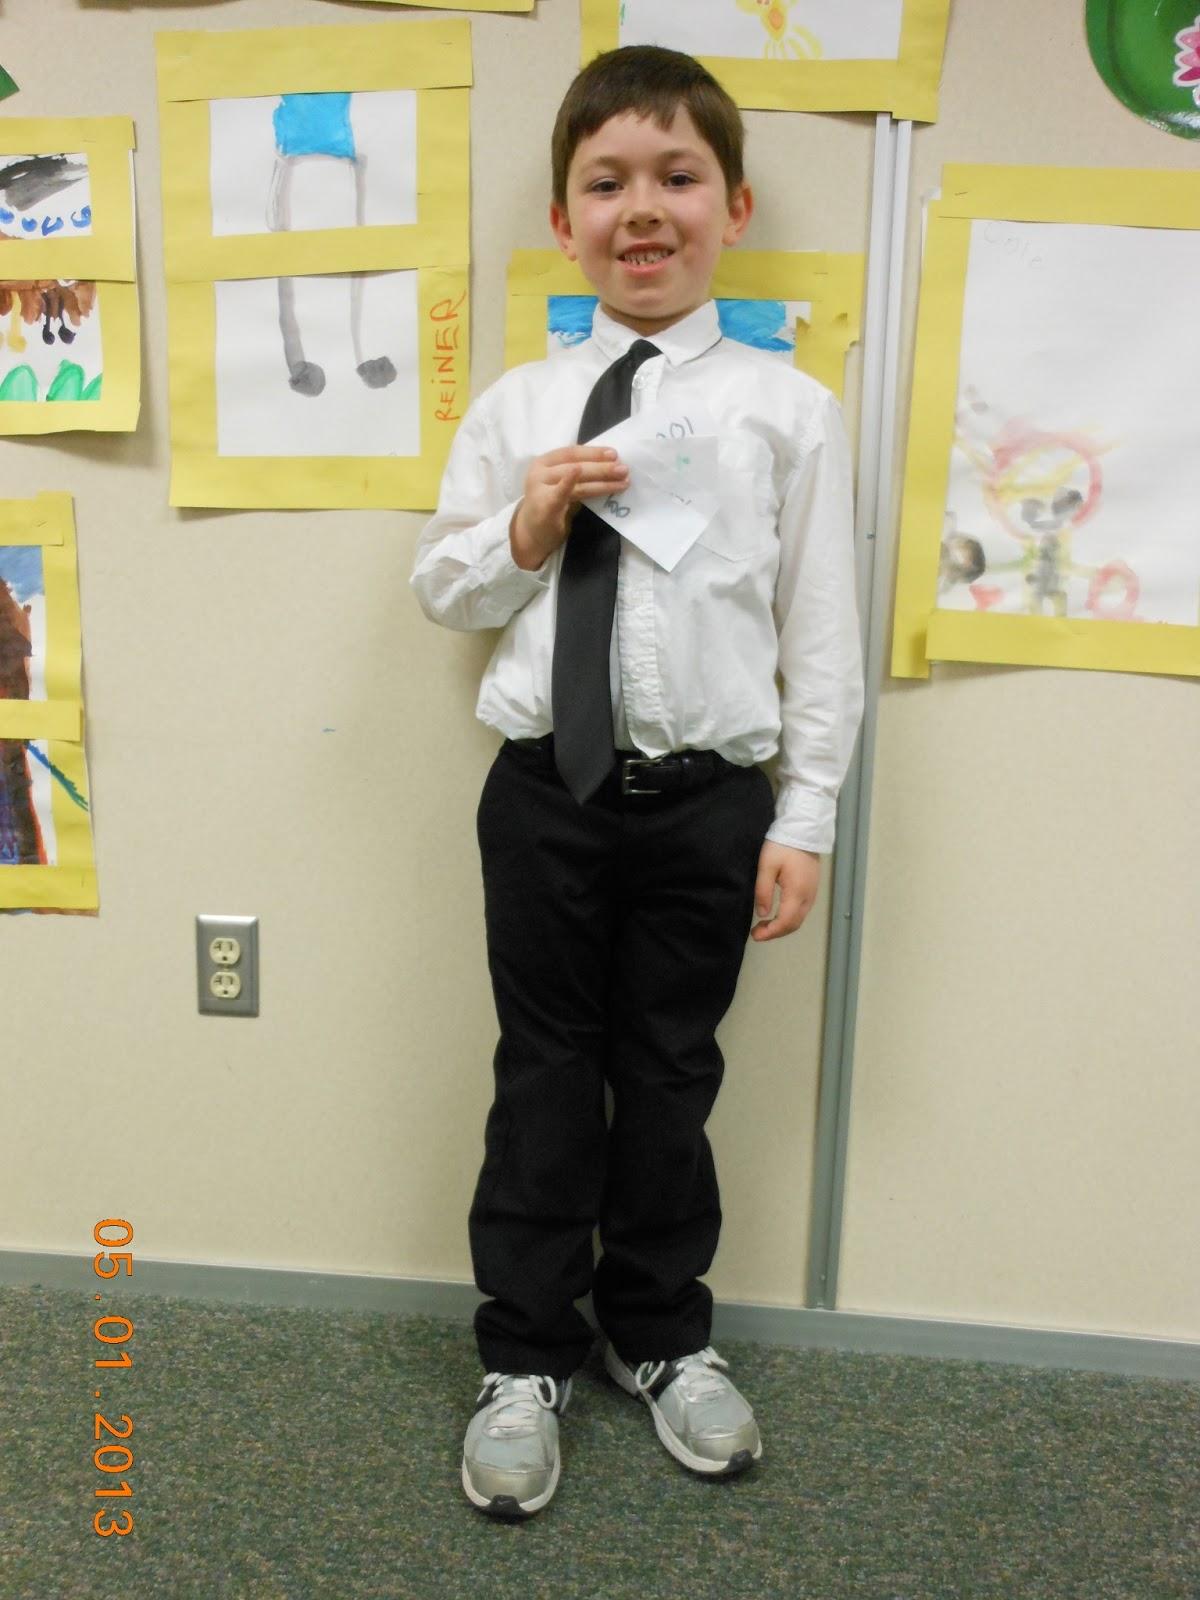 Ms. Tacke's Kindergarten Blog: Career Day!